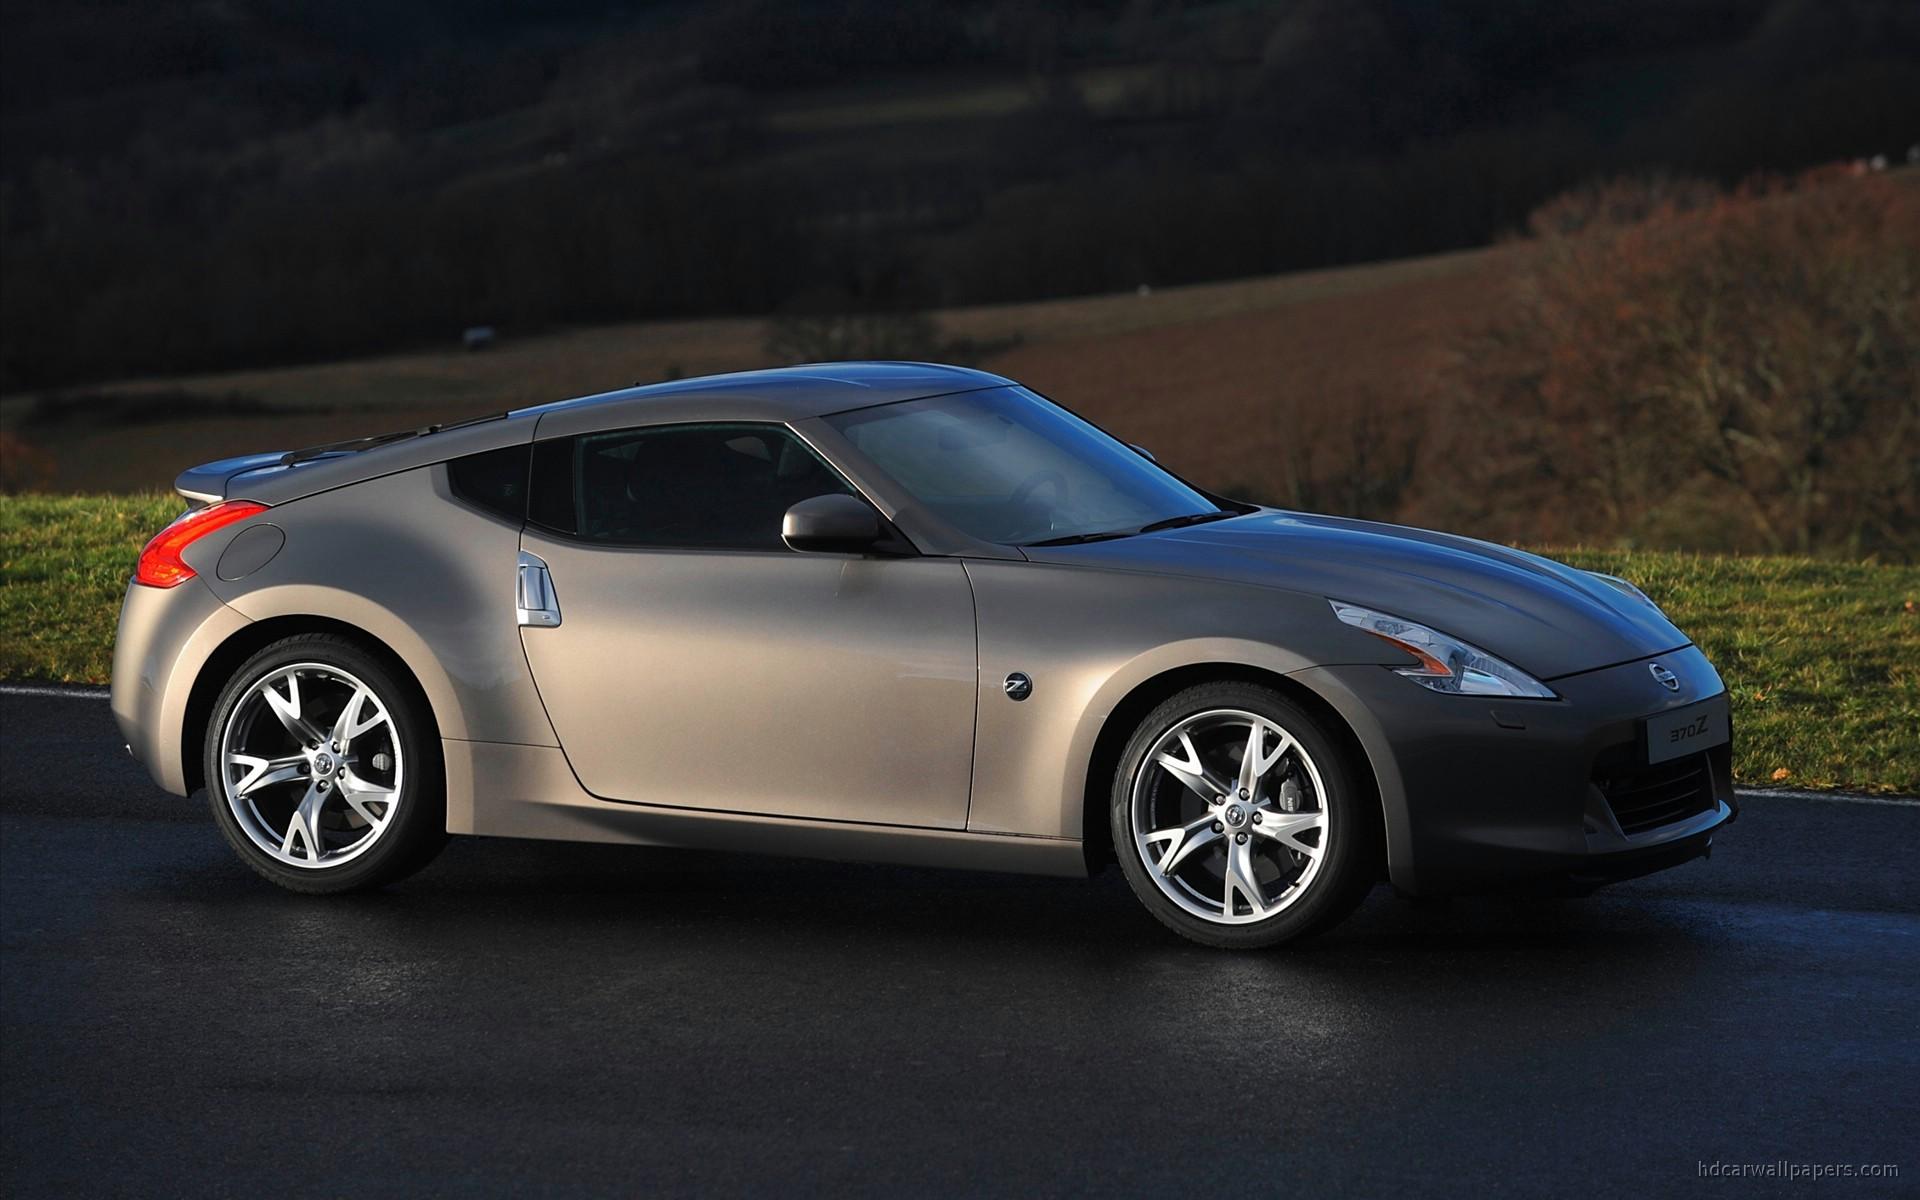 Nissan 370z New Wallpaper Hd Car Wallpapers